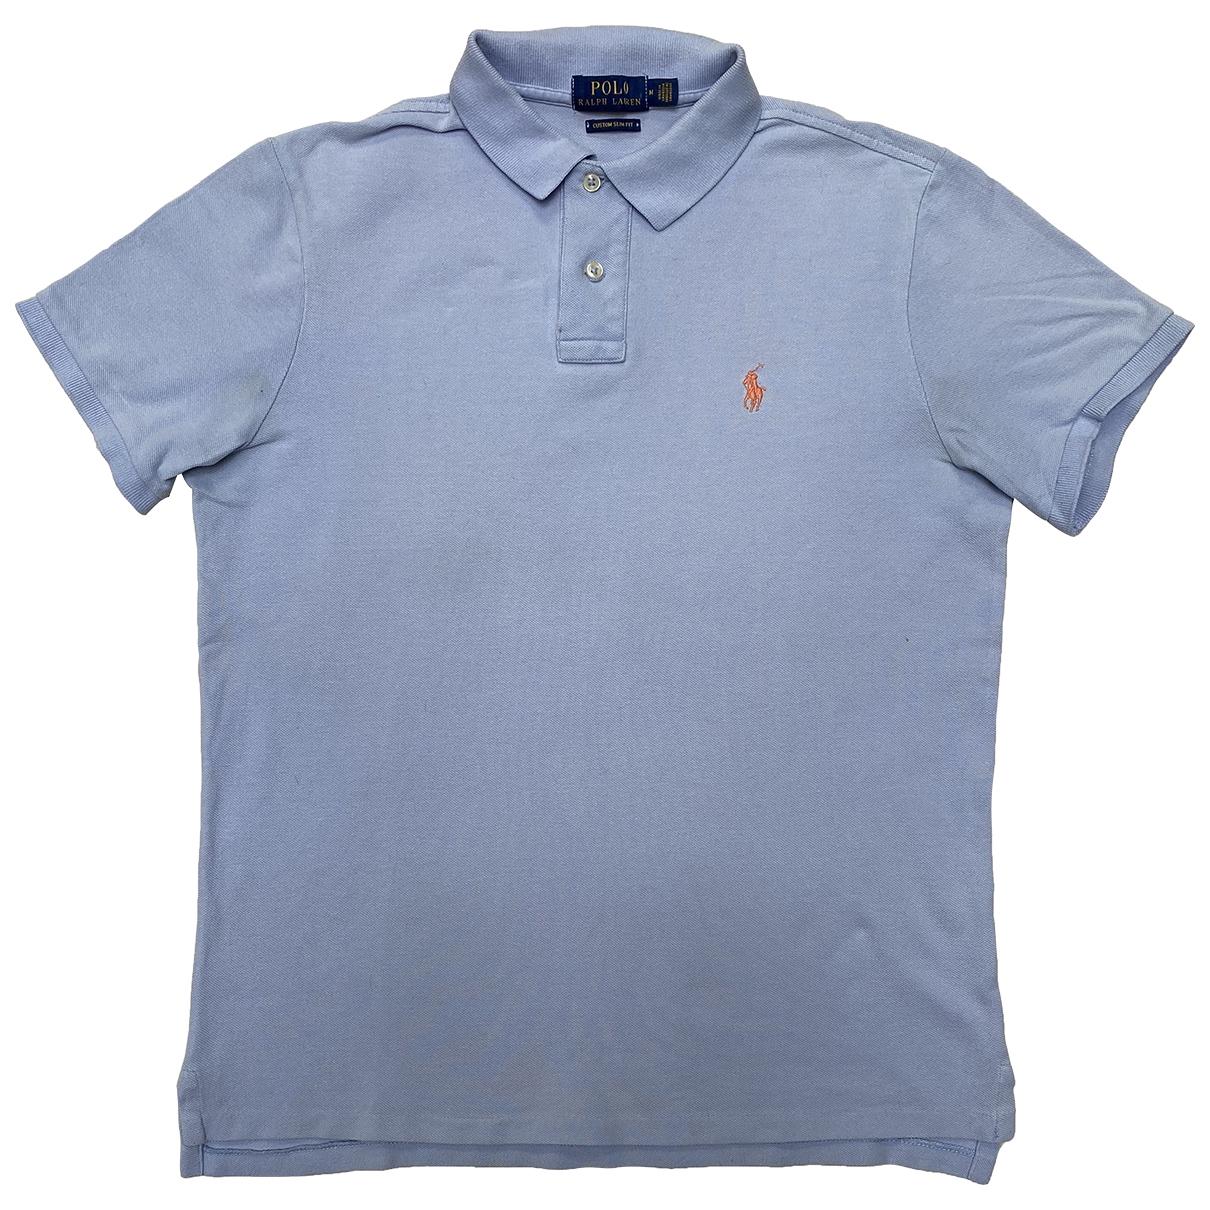 Polo Ralph Lauren Polo cintré manches courtes Blue Cotton Polo shirts for Men M International